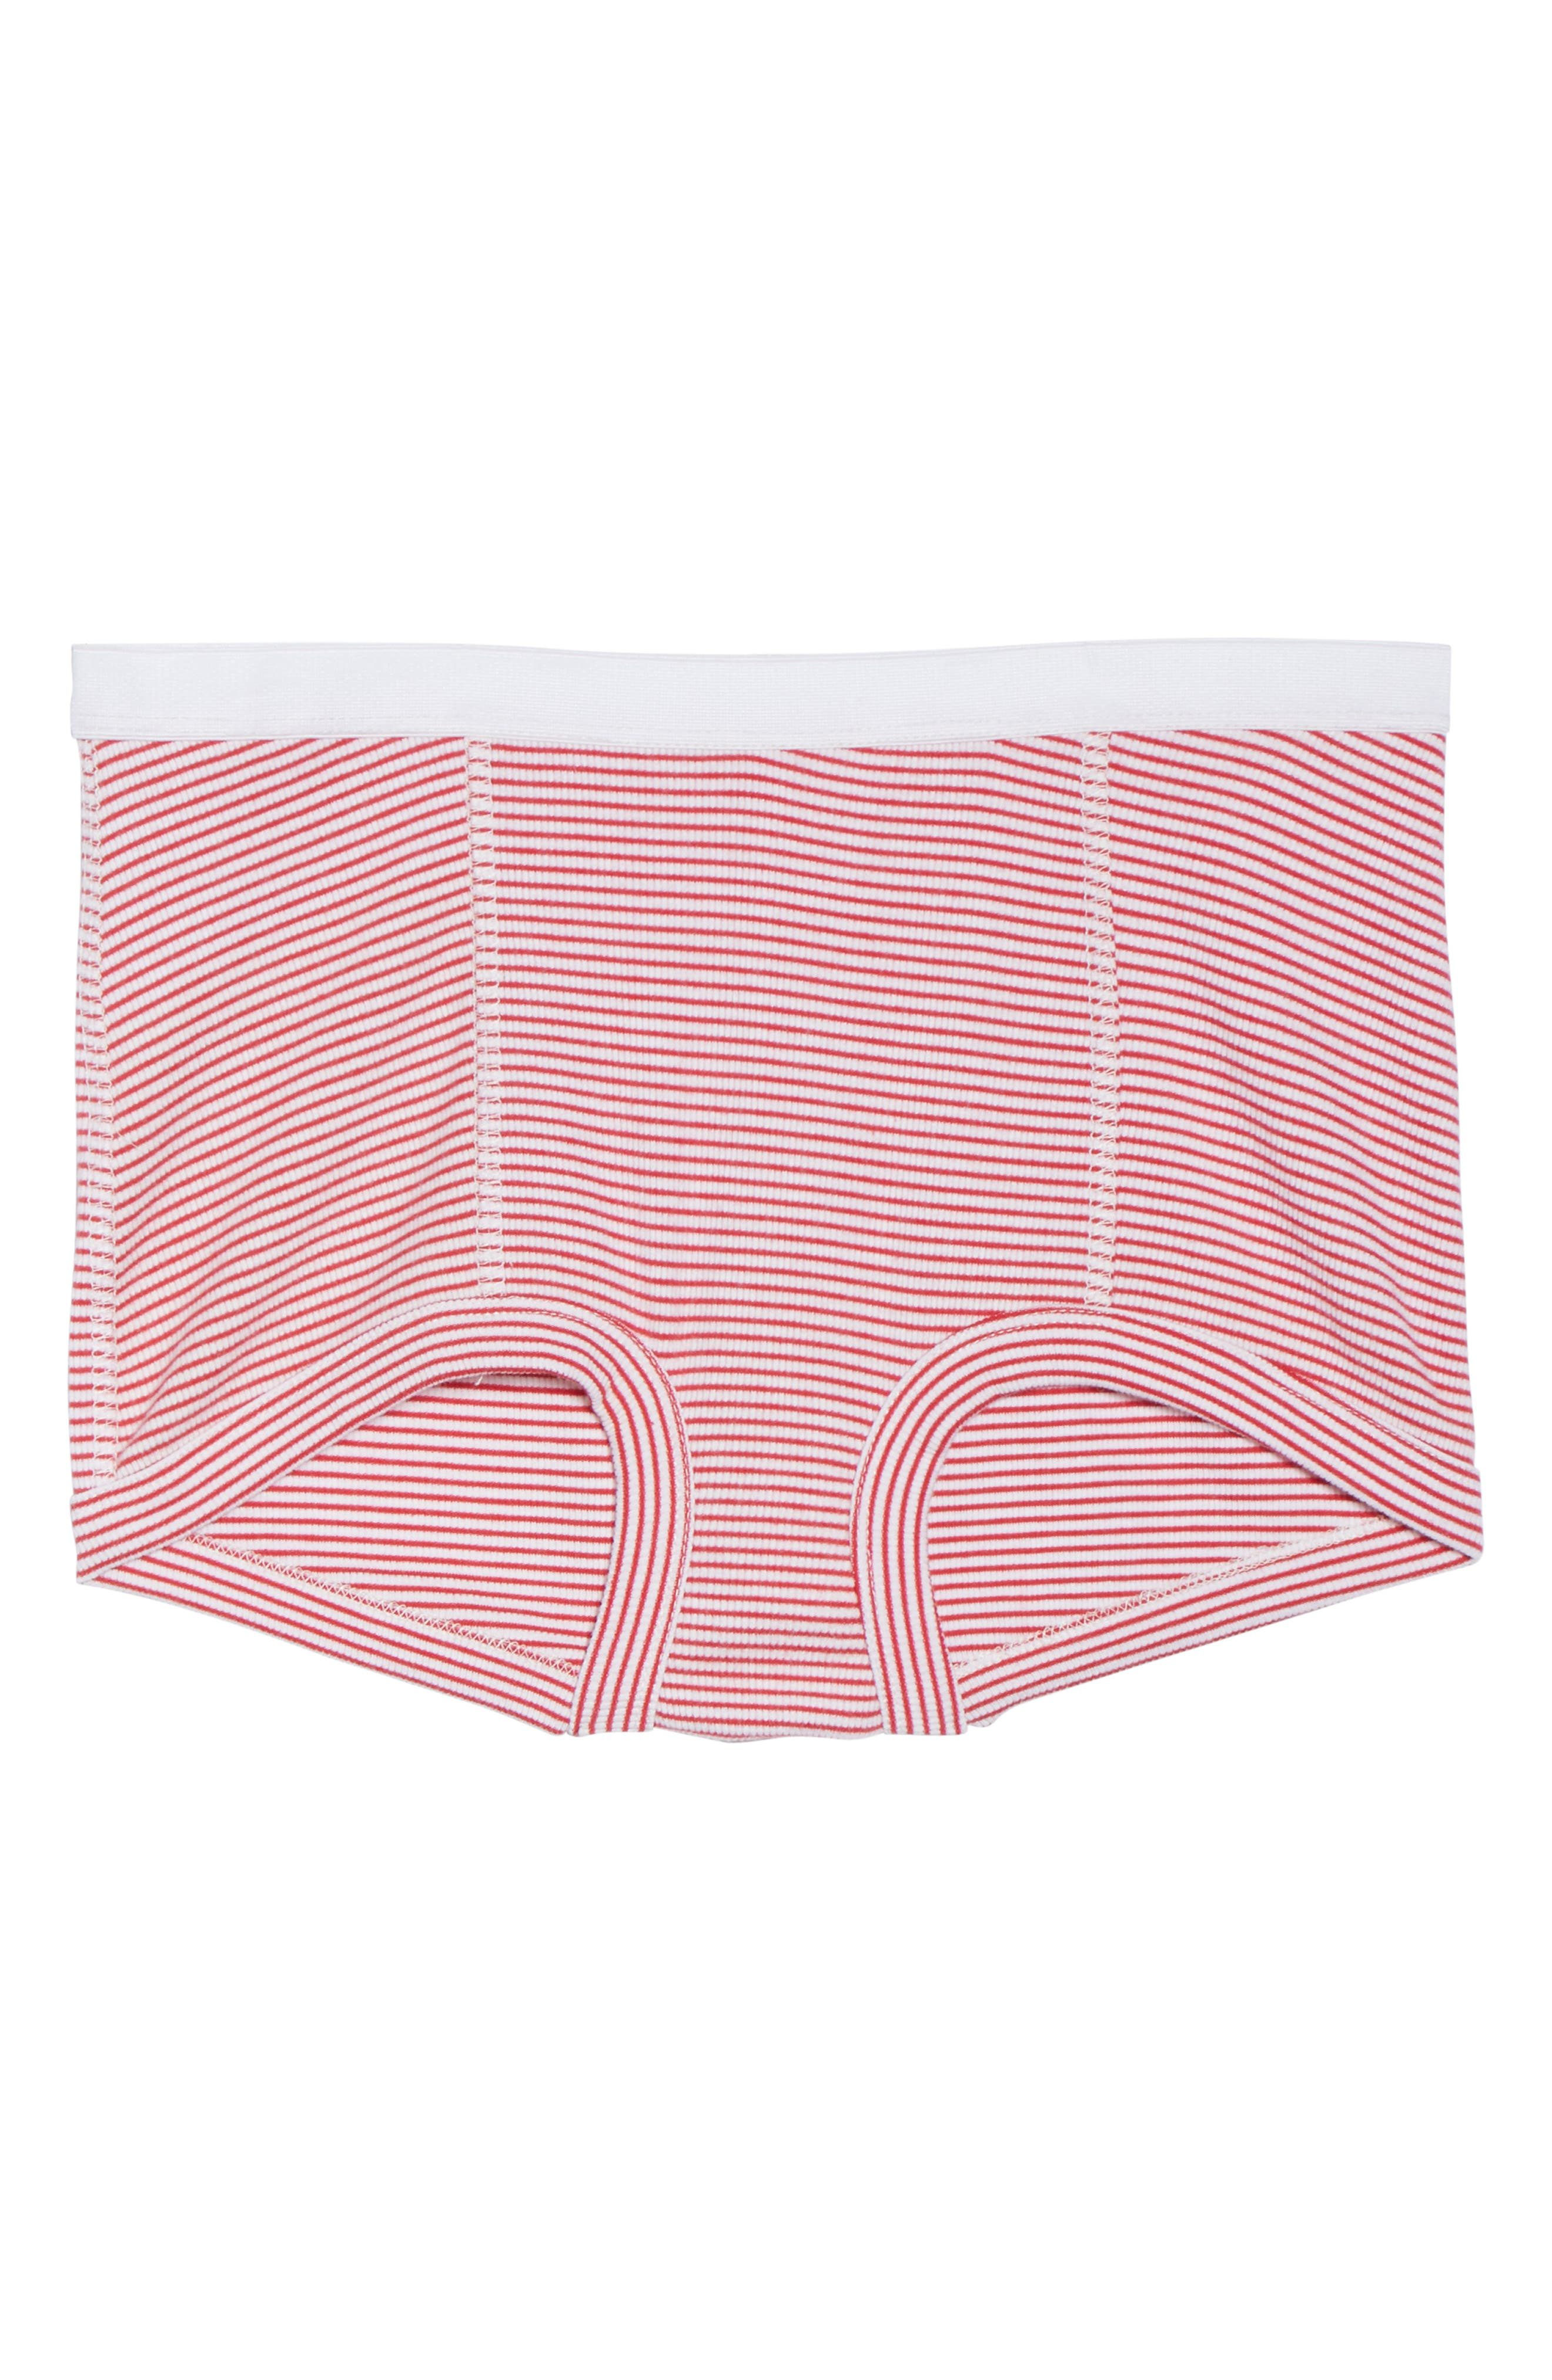 Peony Shorts,                             Alternate thumbnail 6, color,                             Red Stripe